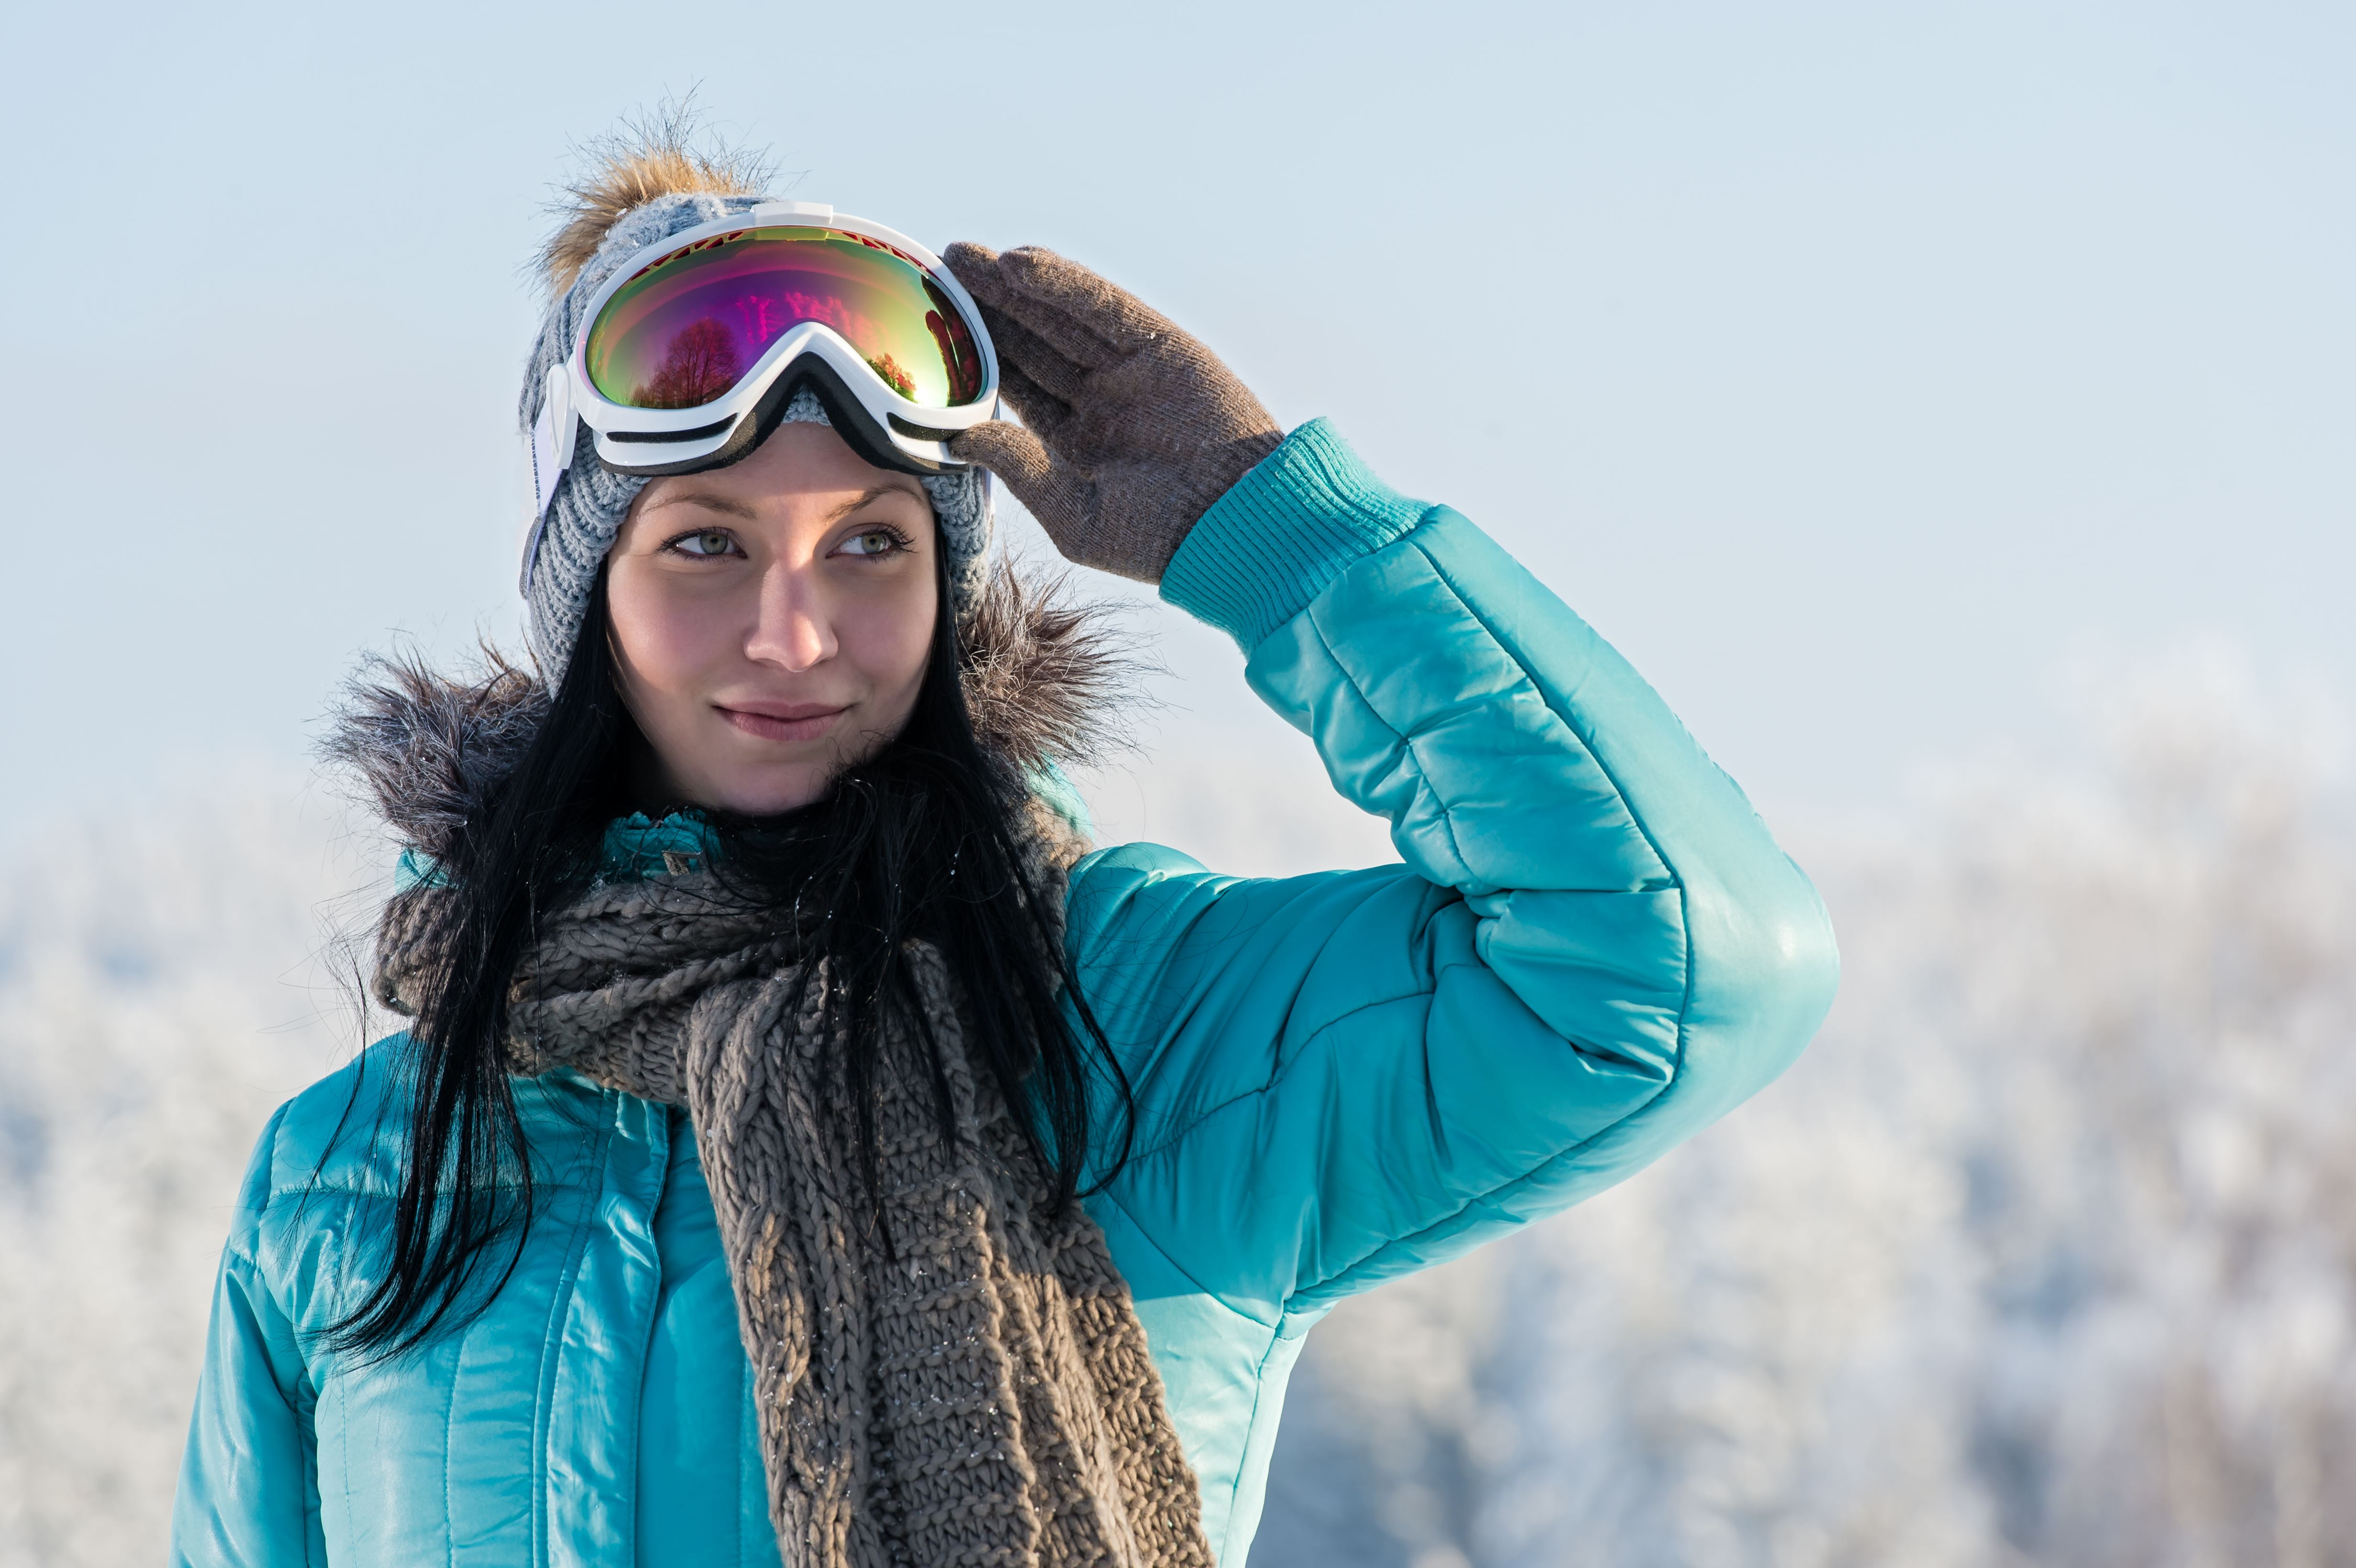 Wintersports at Middagsberget